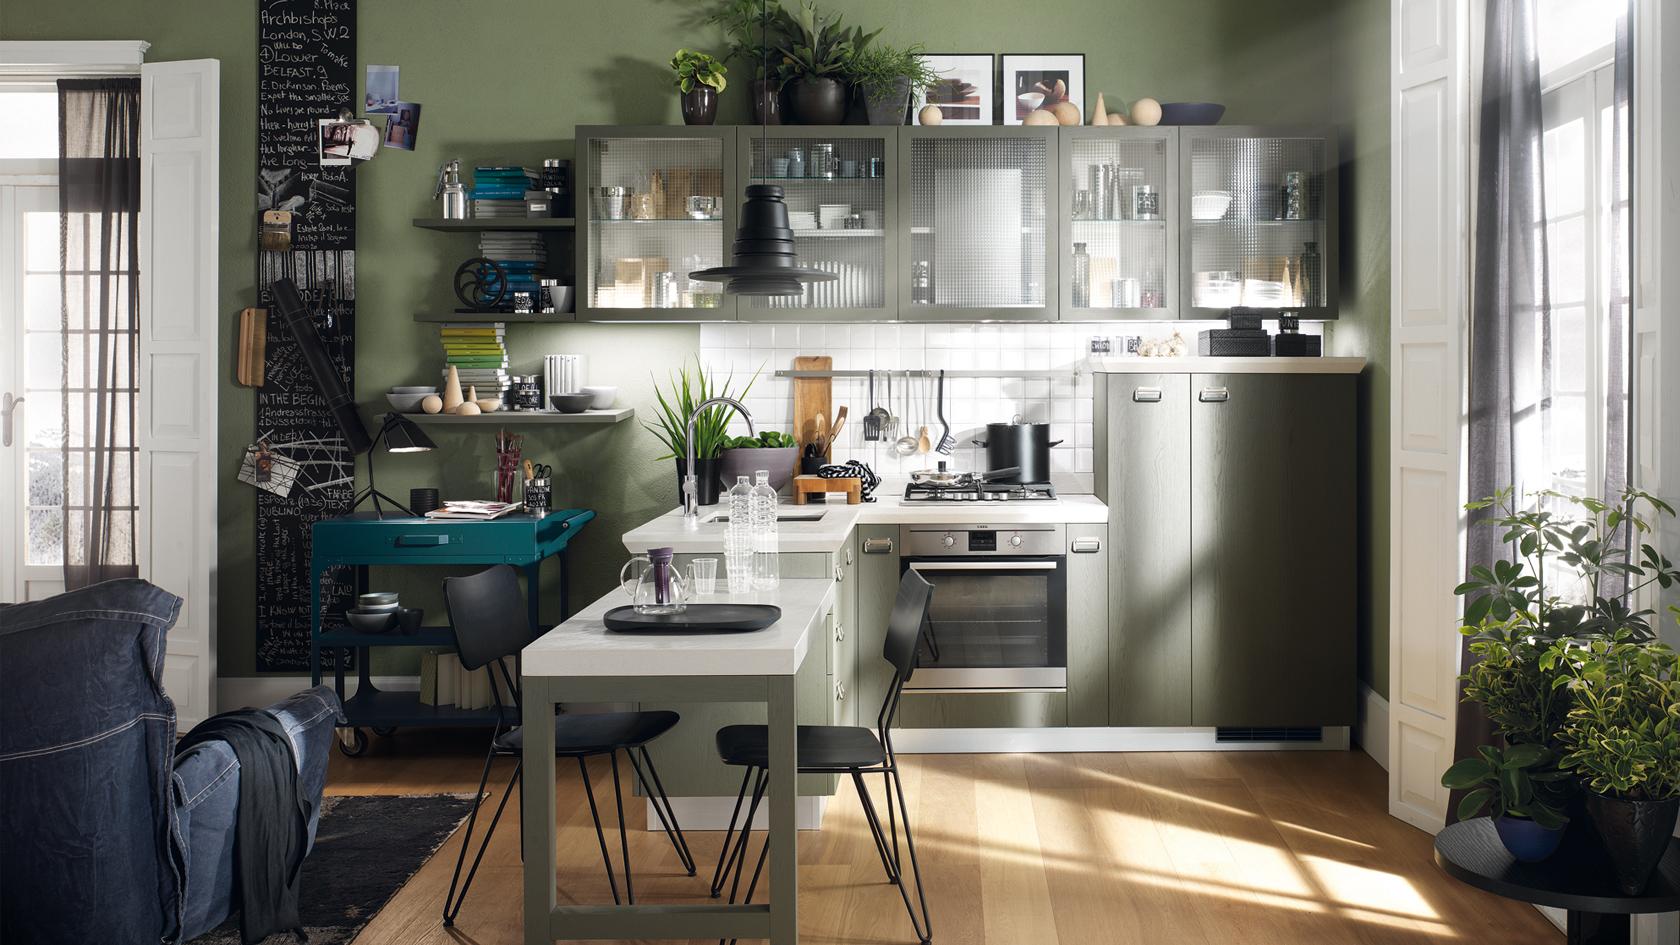 Diesel scavolini progetto cucine social 6 design mon amour - Scavolini cucine diesel ...